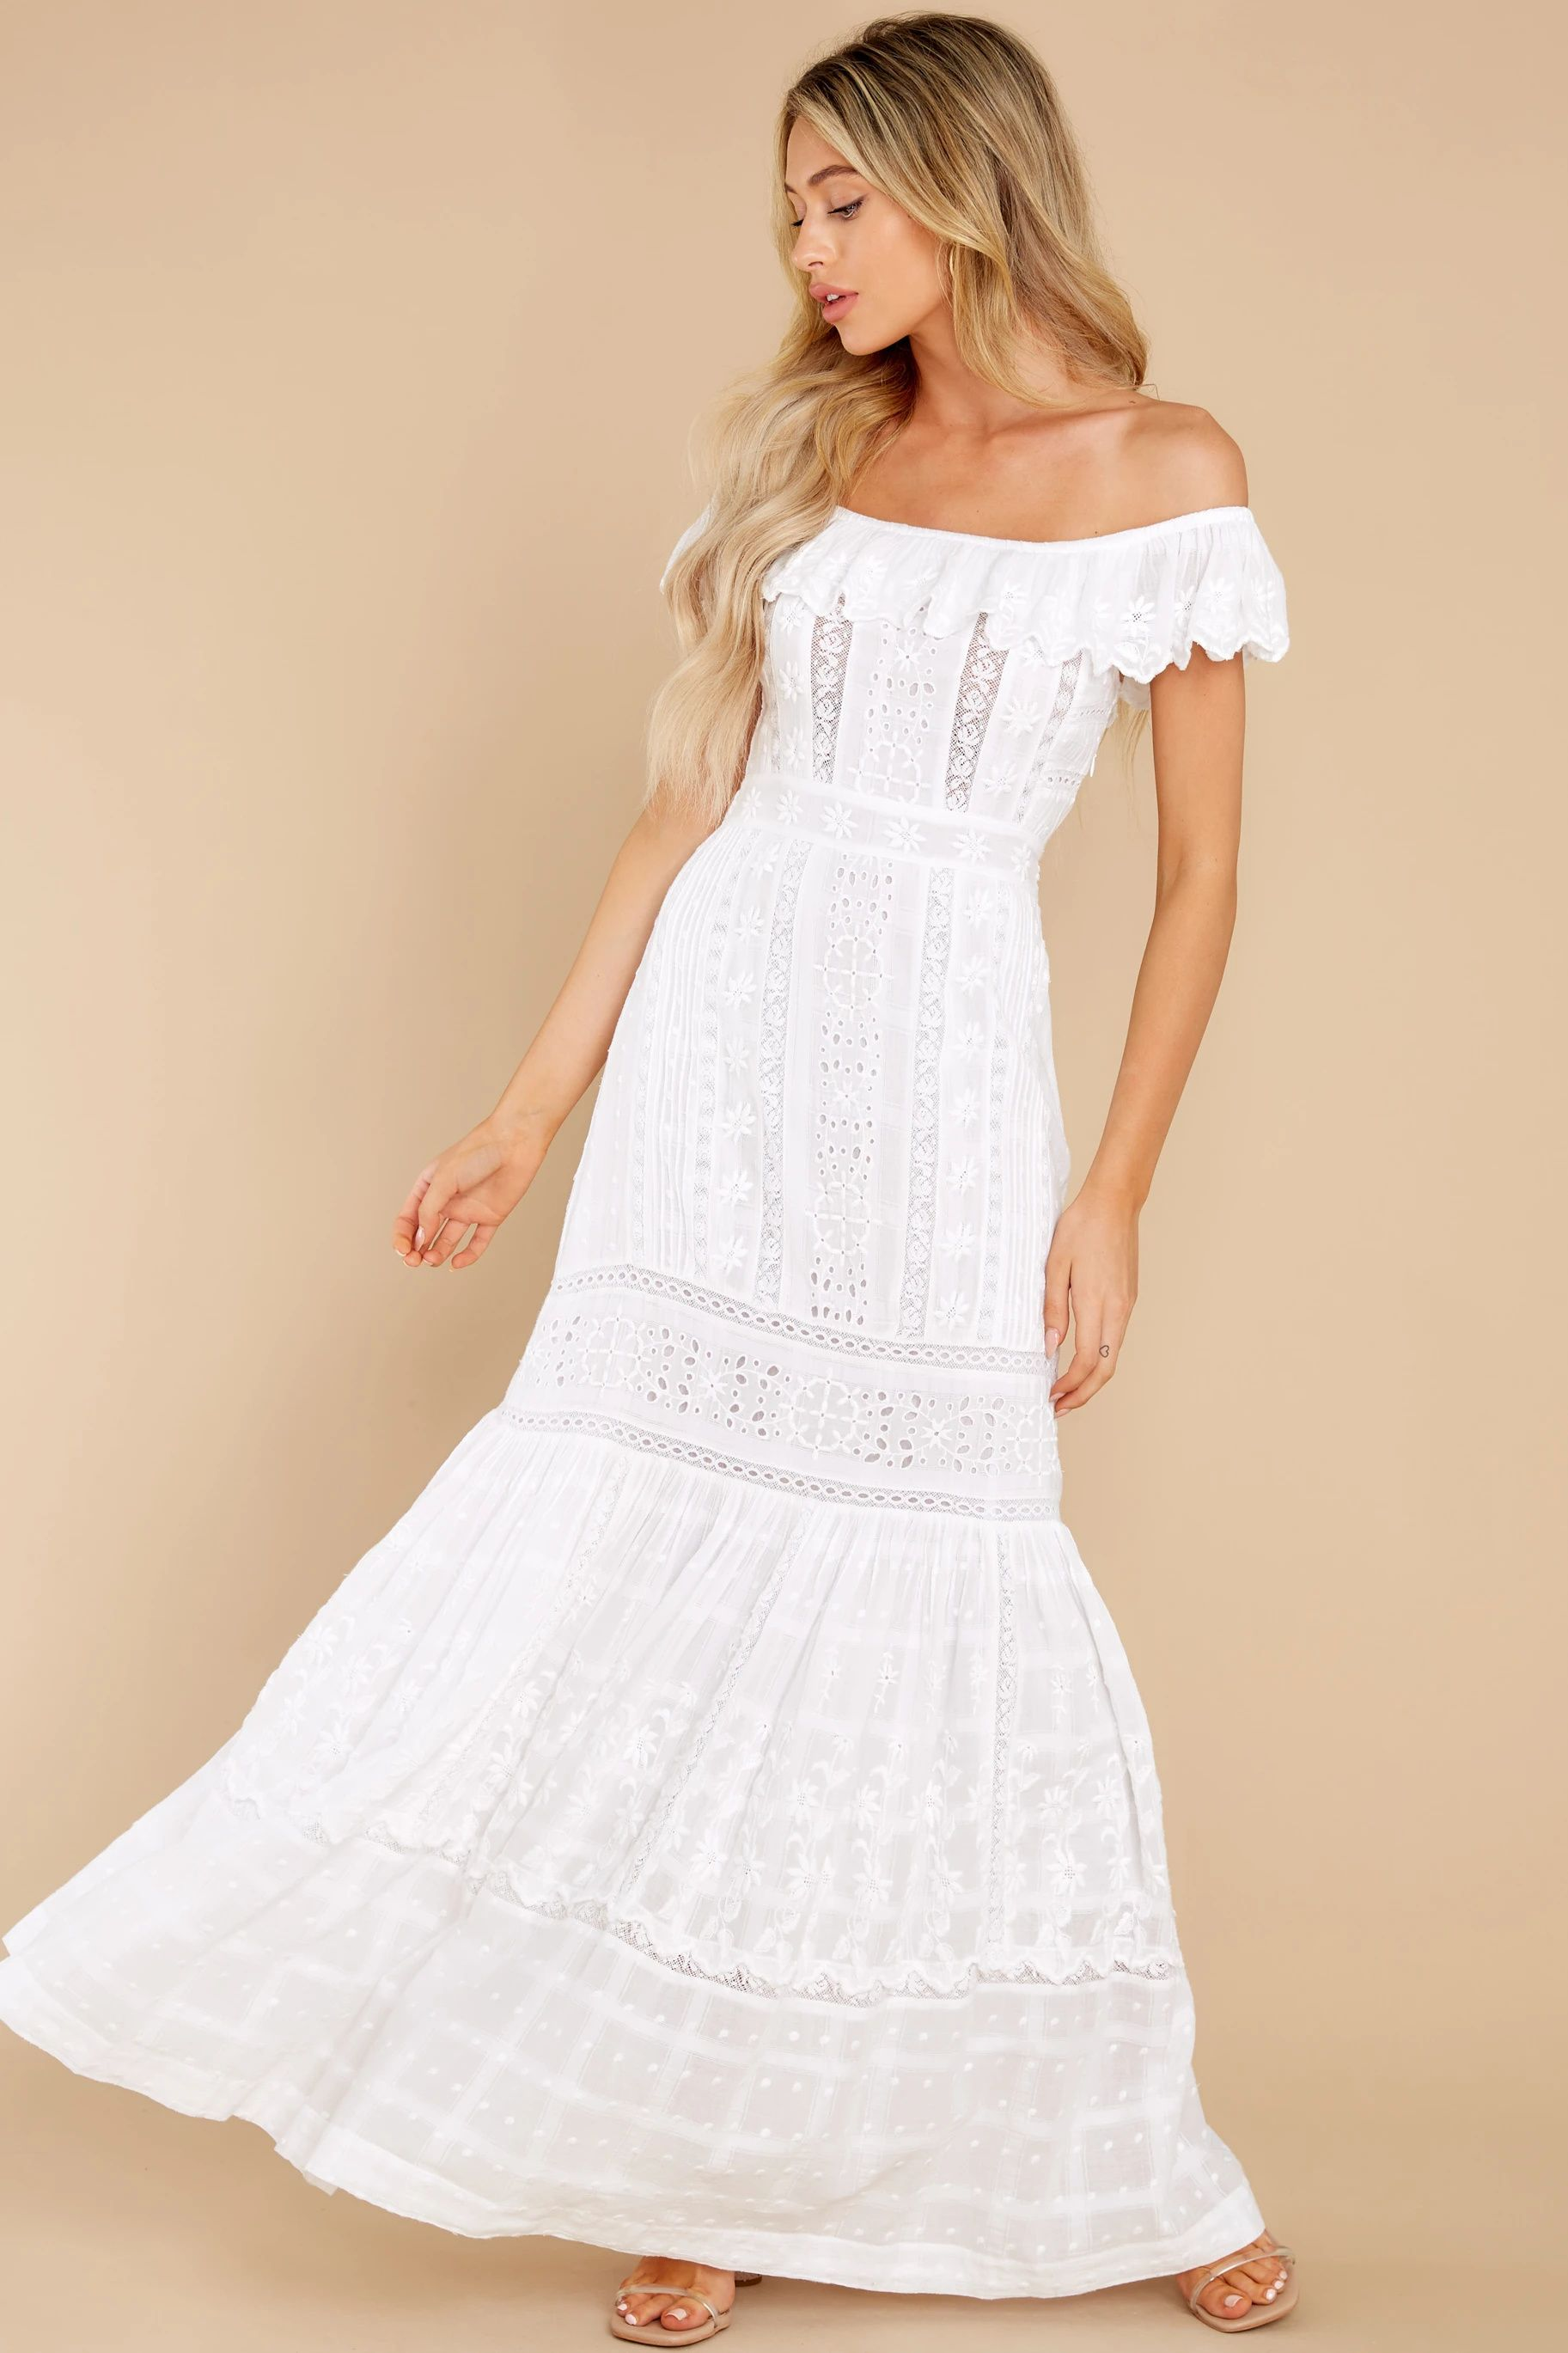 70s Dresses White Sleeveless Disco Dress Shop Red Dress White Dress [ 2738 x 1825 Pixel ]